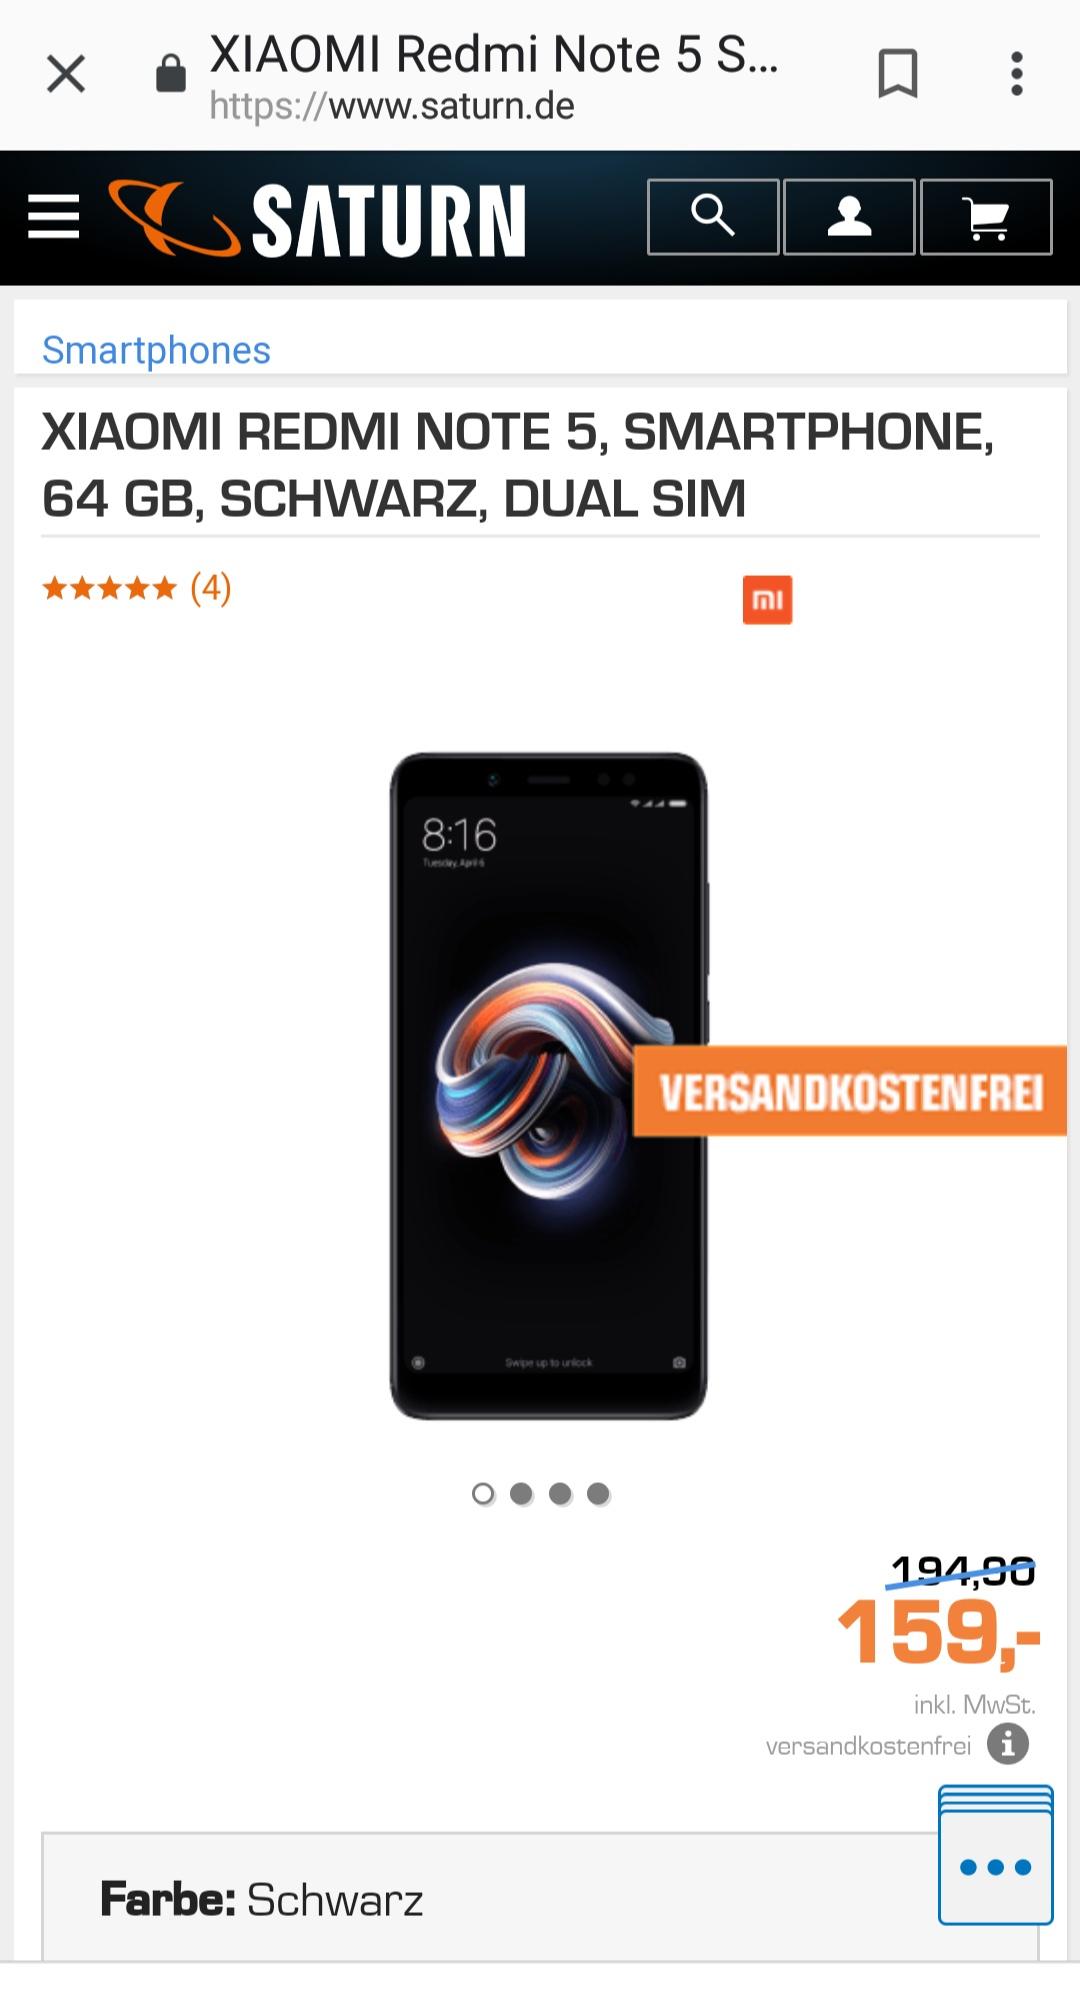 XIAOMI REDMI NOTE 5, SMARTPHONE, 64 GB, SCHWARZ, DUAL SIM